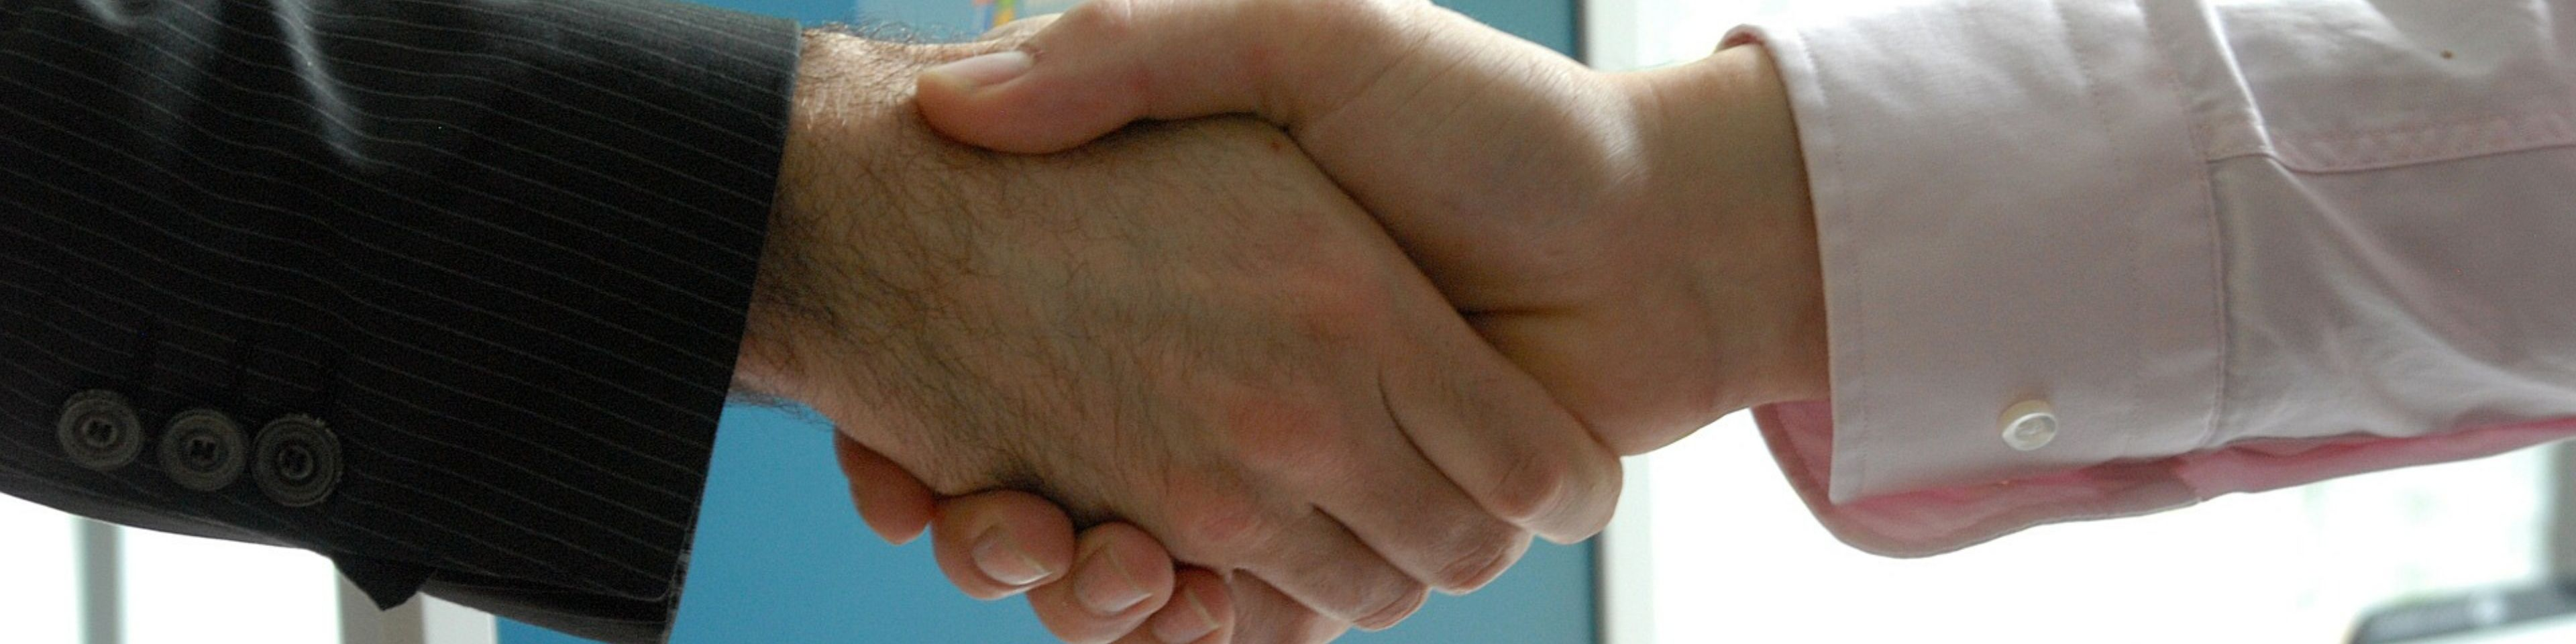 Legisway-customer oriented contract management